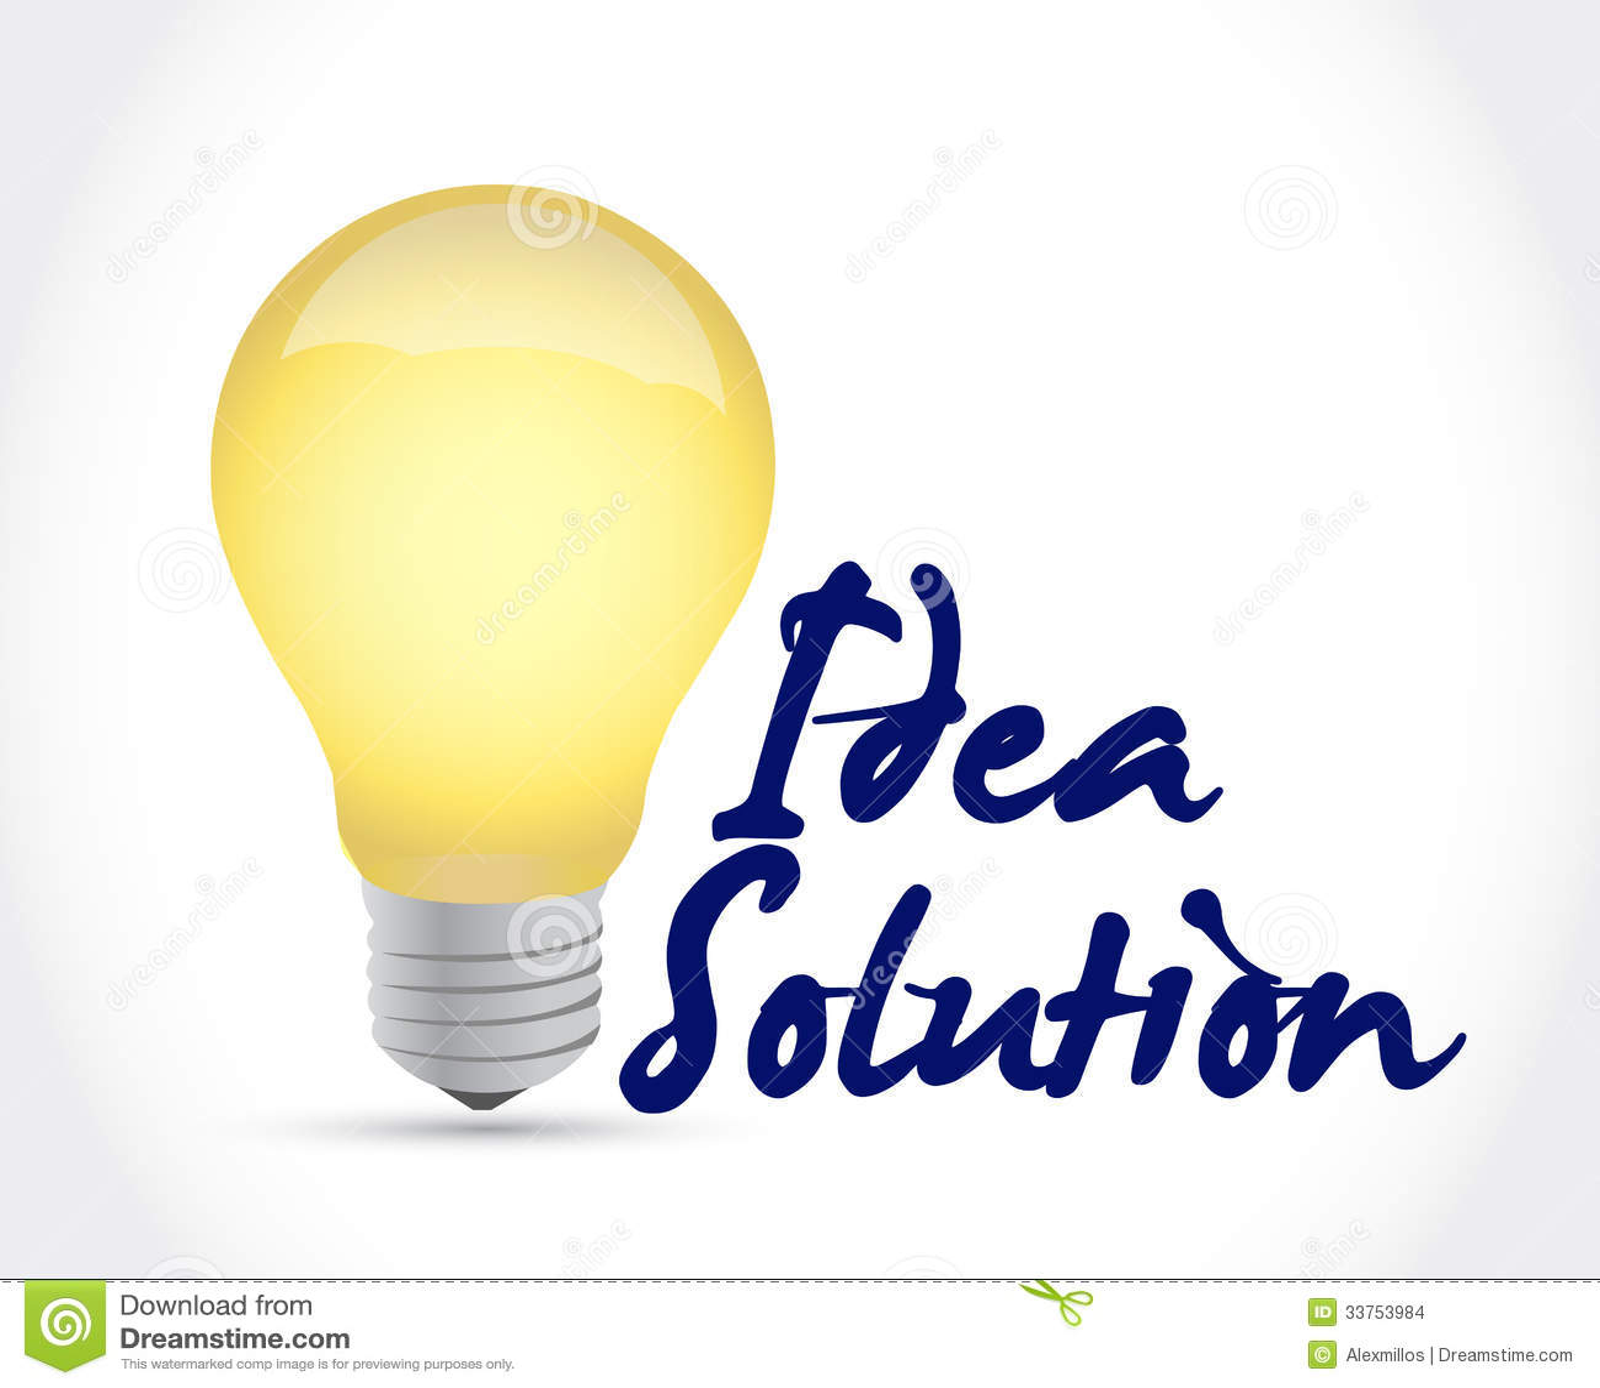 Idees And Solutions: Idea Solution Light Bulb Illustration Design Stock